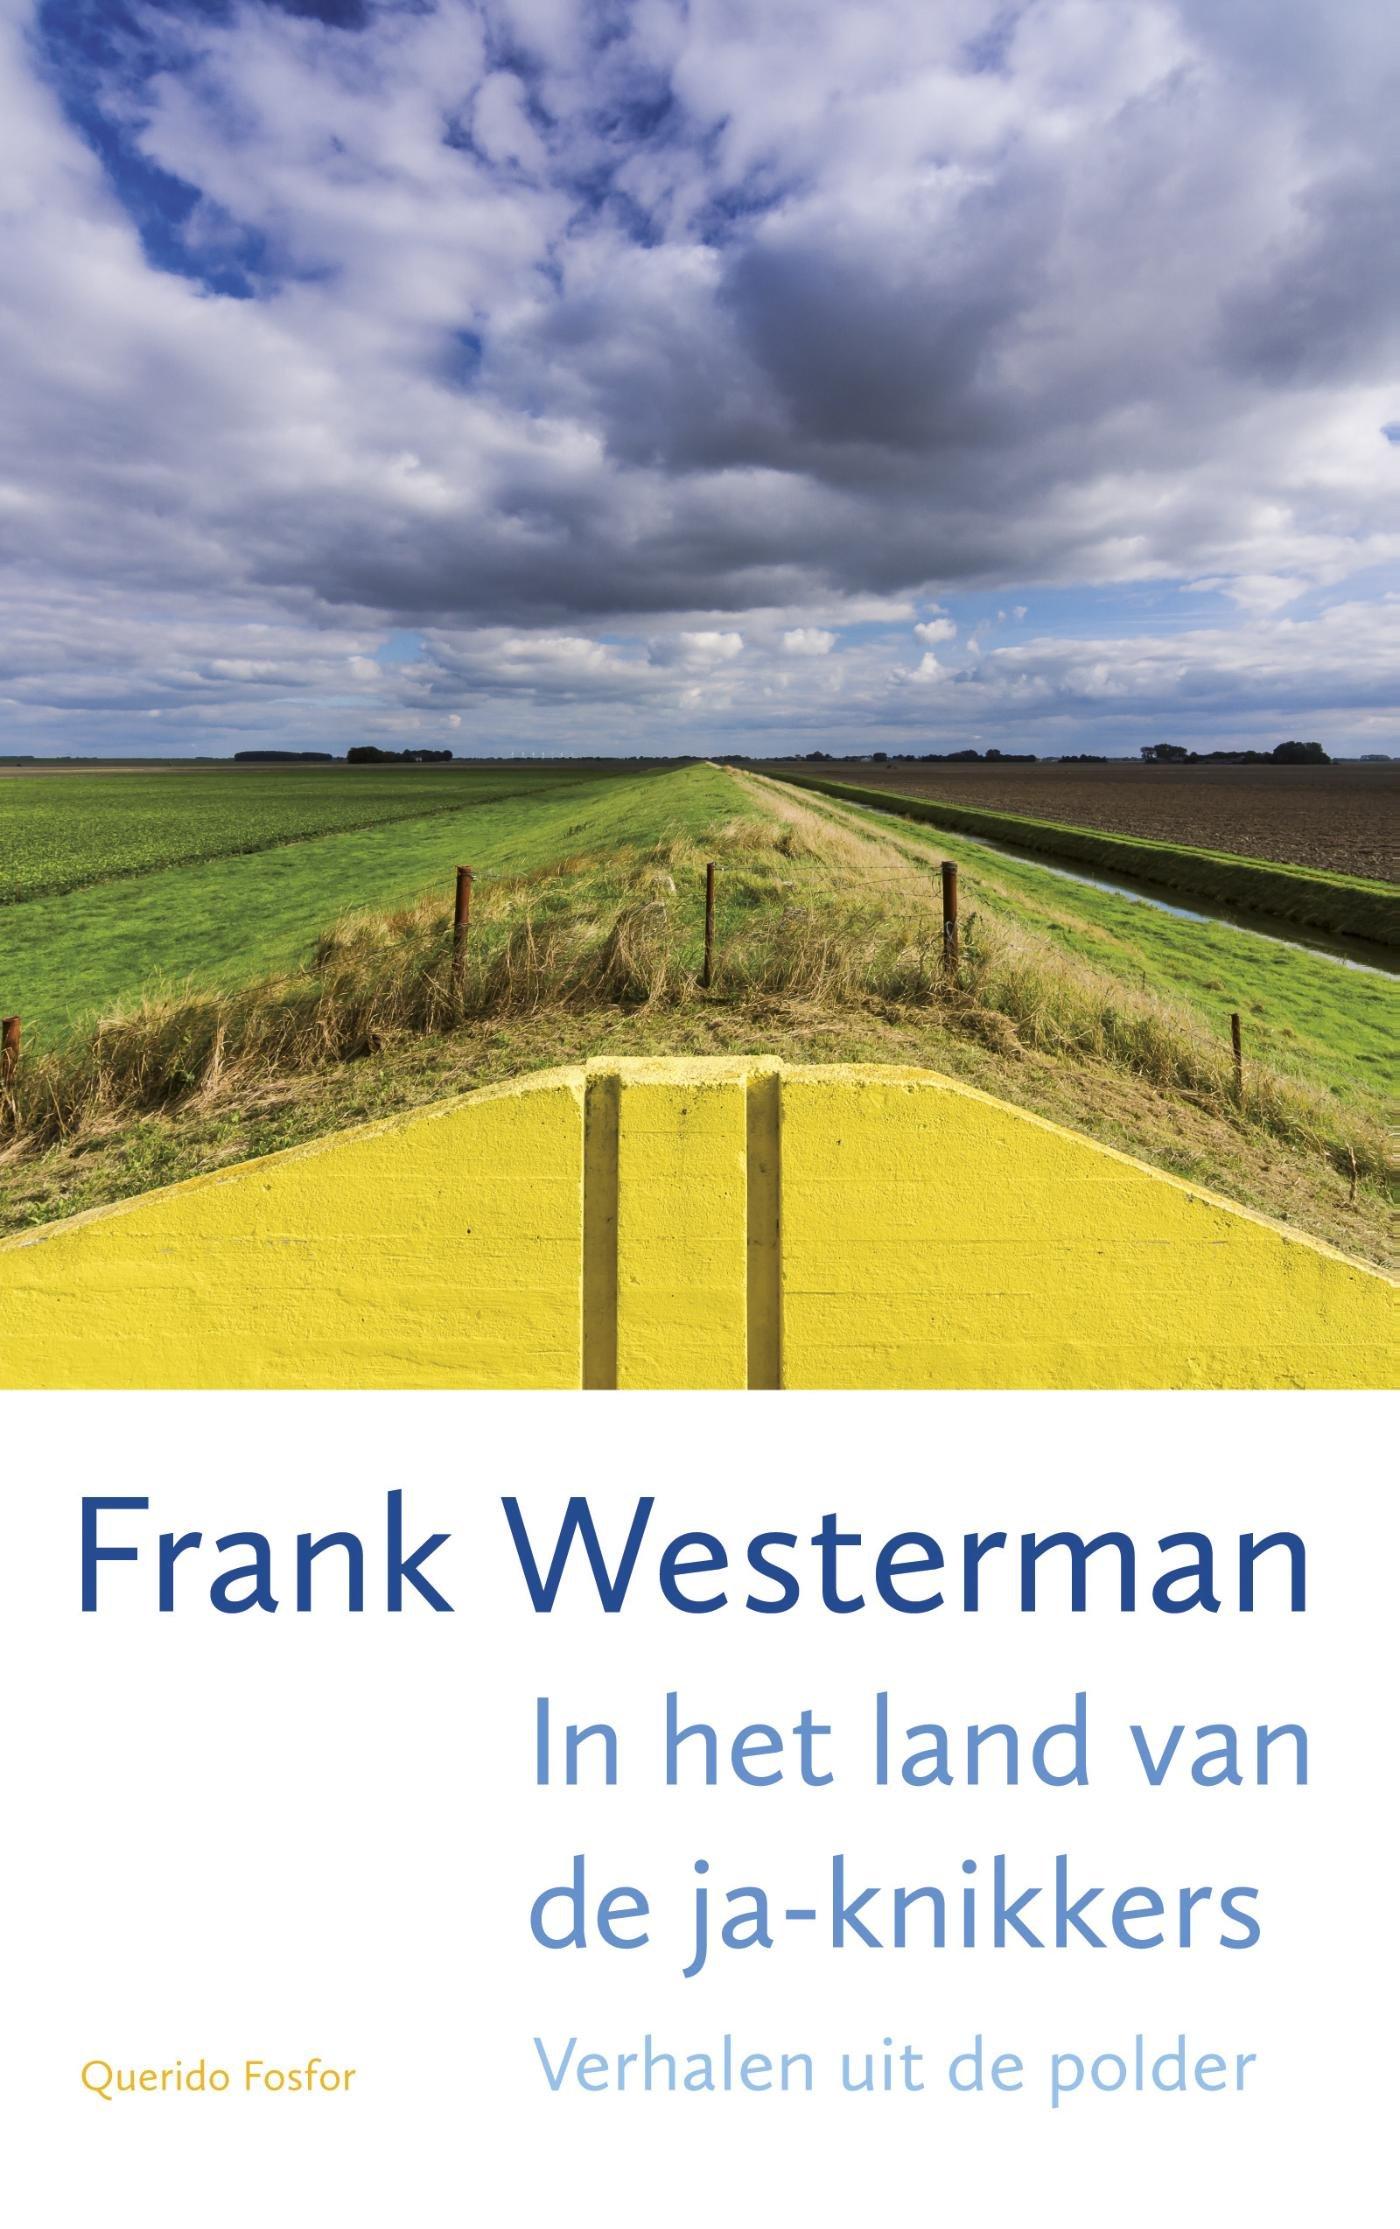 In het land van de ja-knikkers   Frank Westerman 9789021406145 Frank Westerman Singel   Reisverhalen Nederland